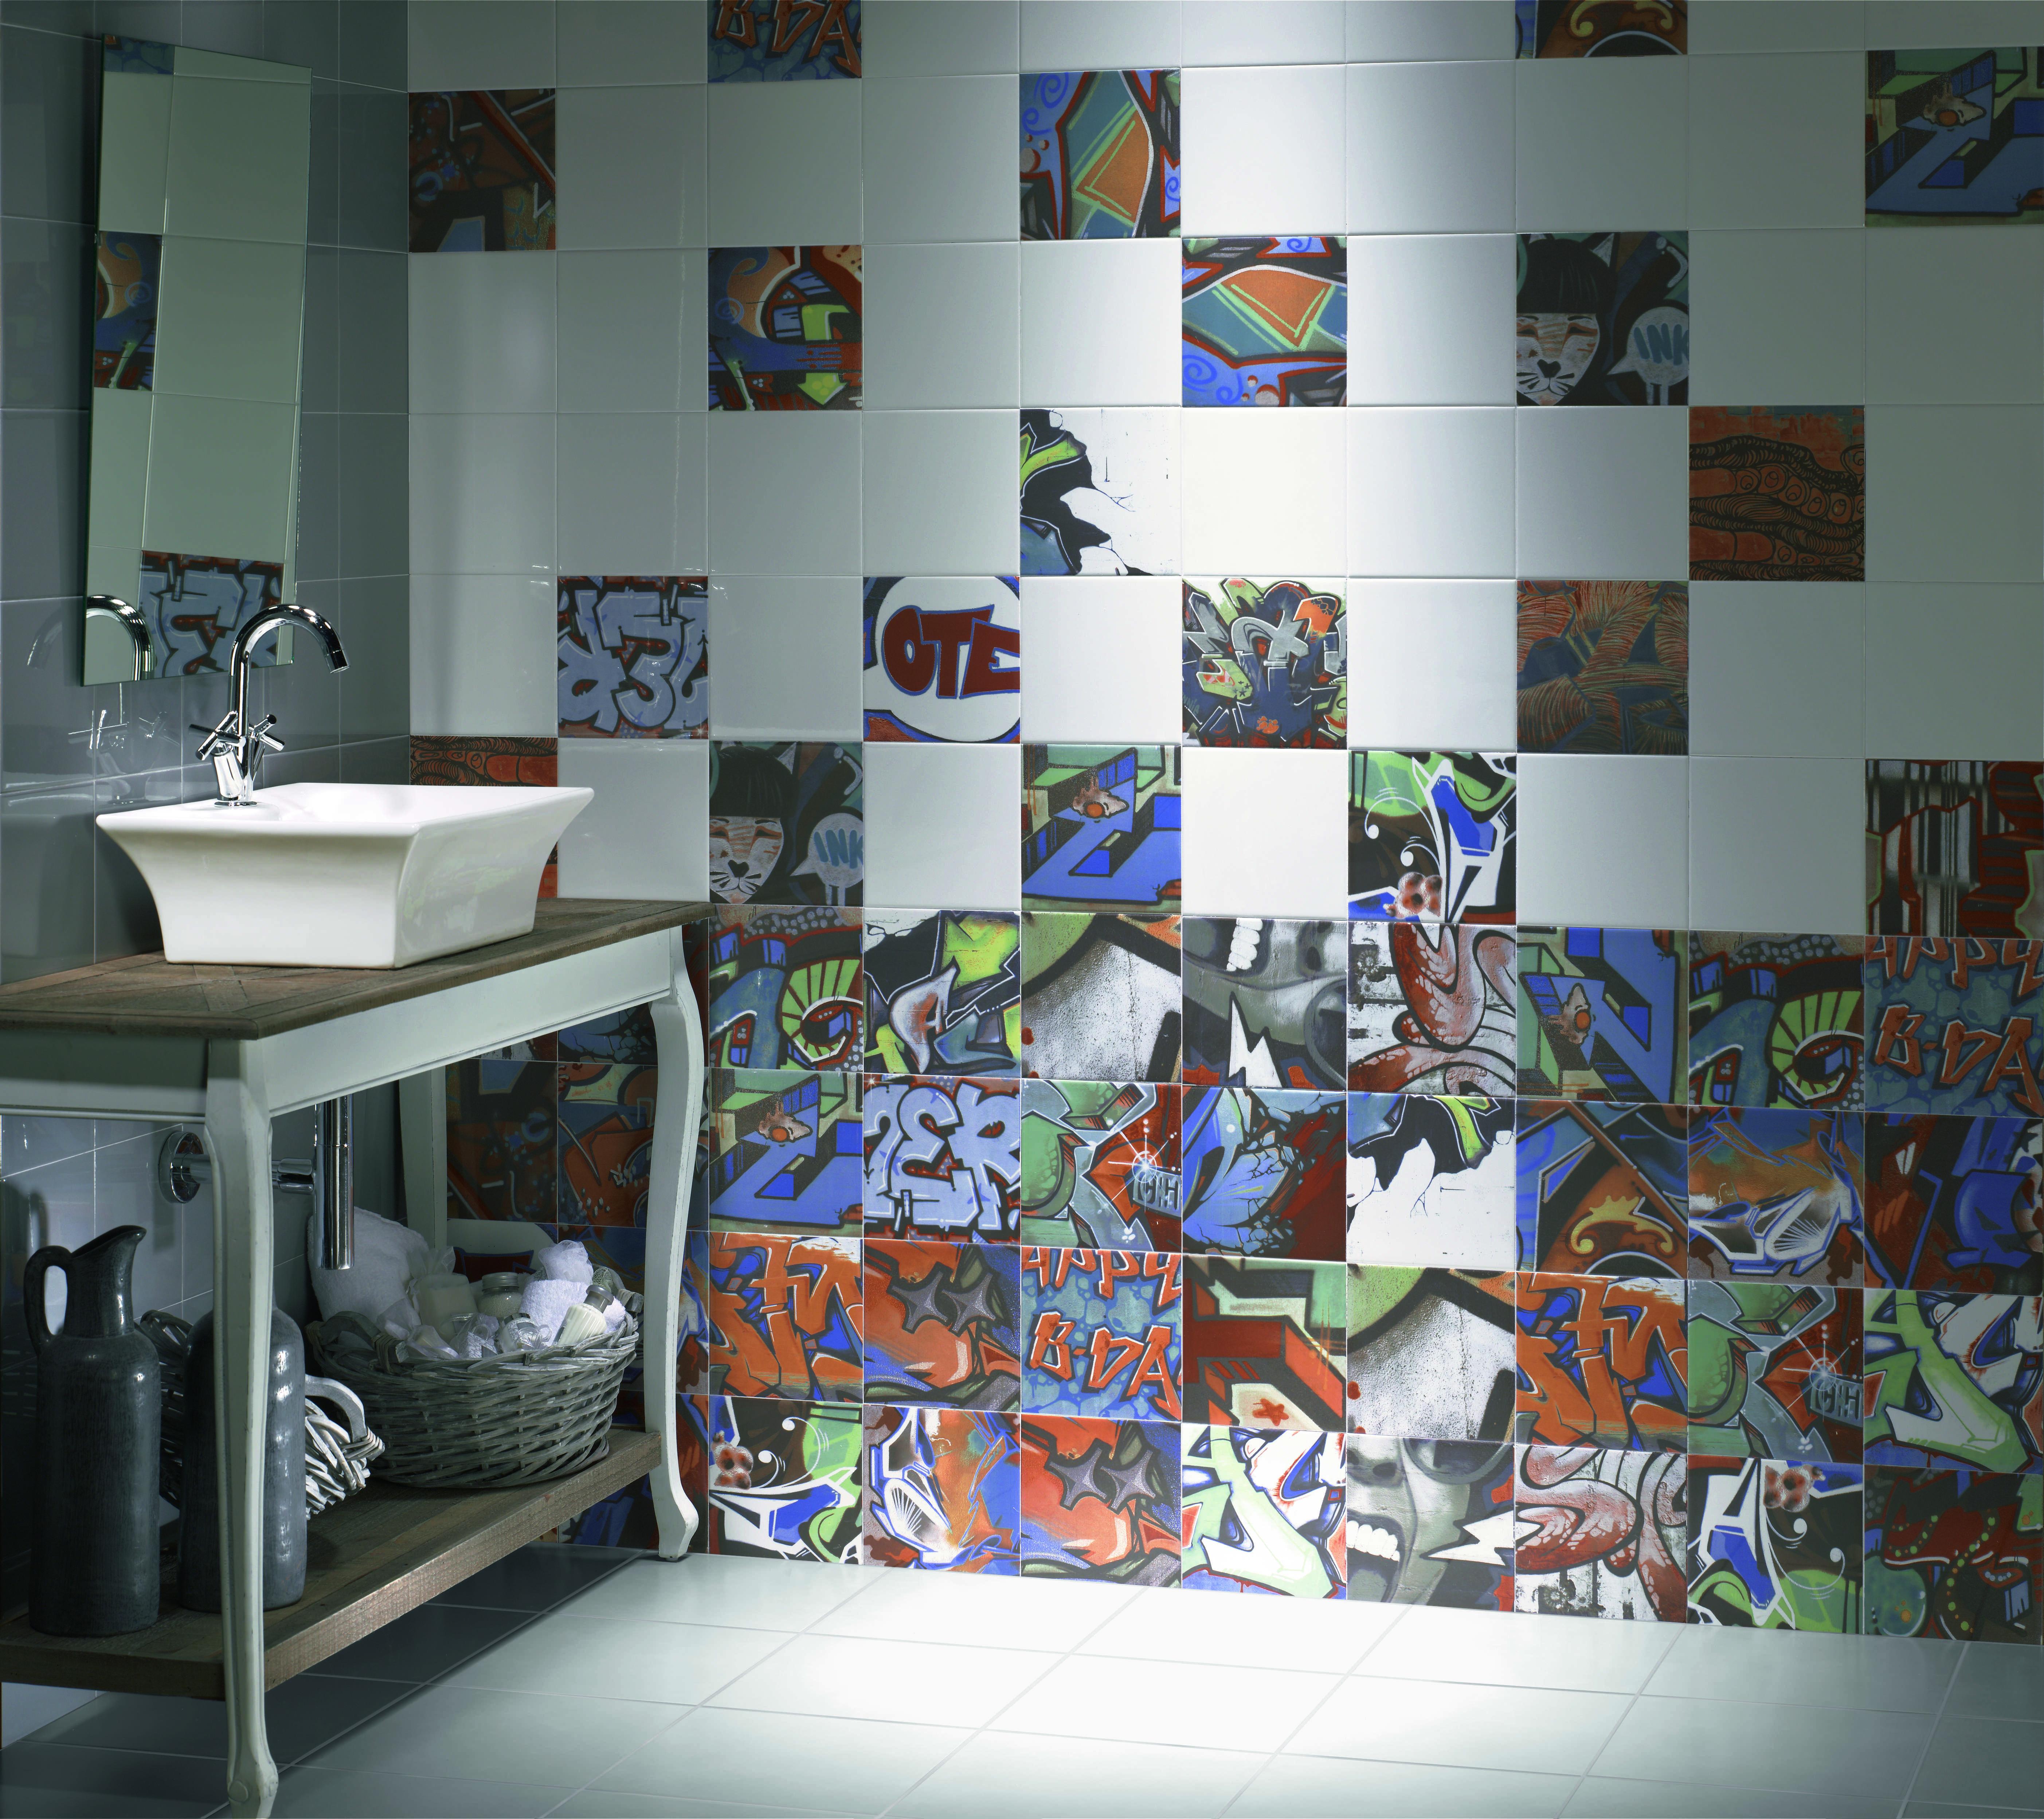 Graffiti wall tiles - One